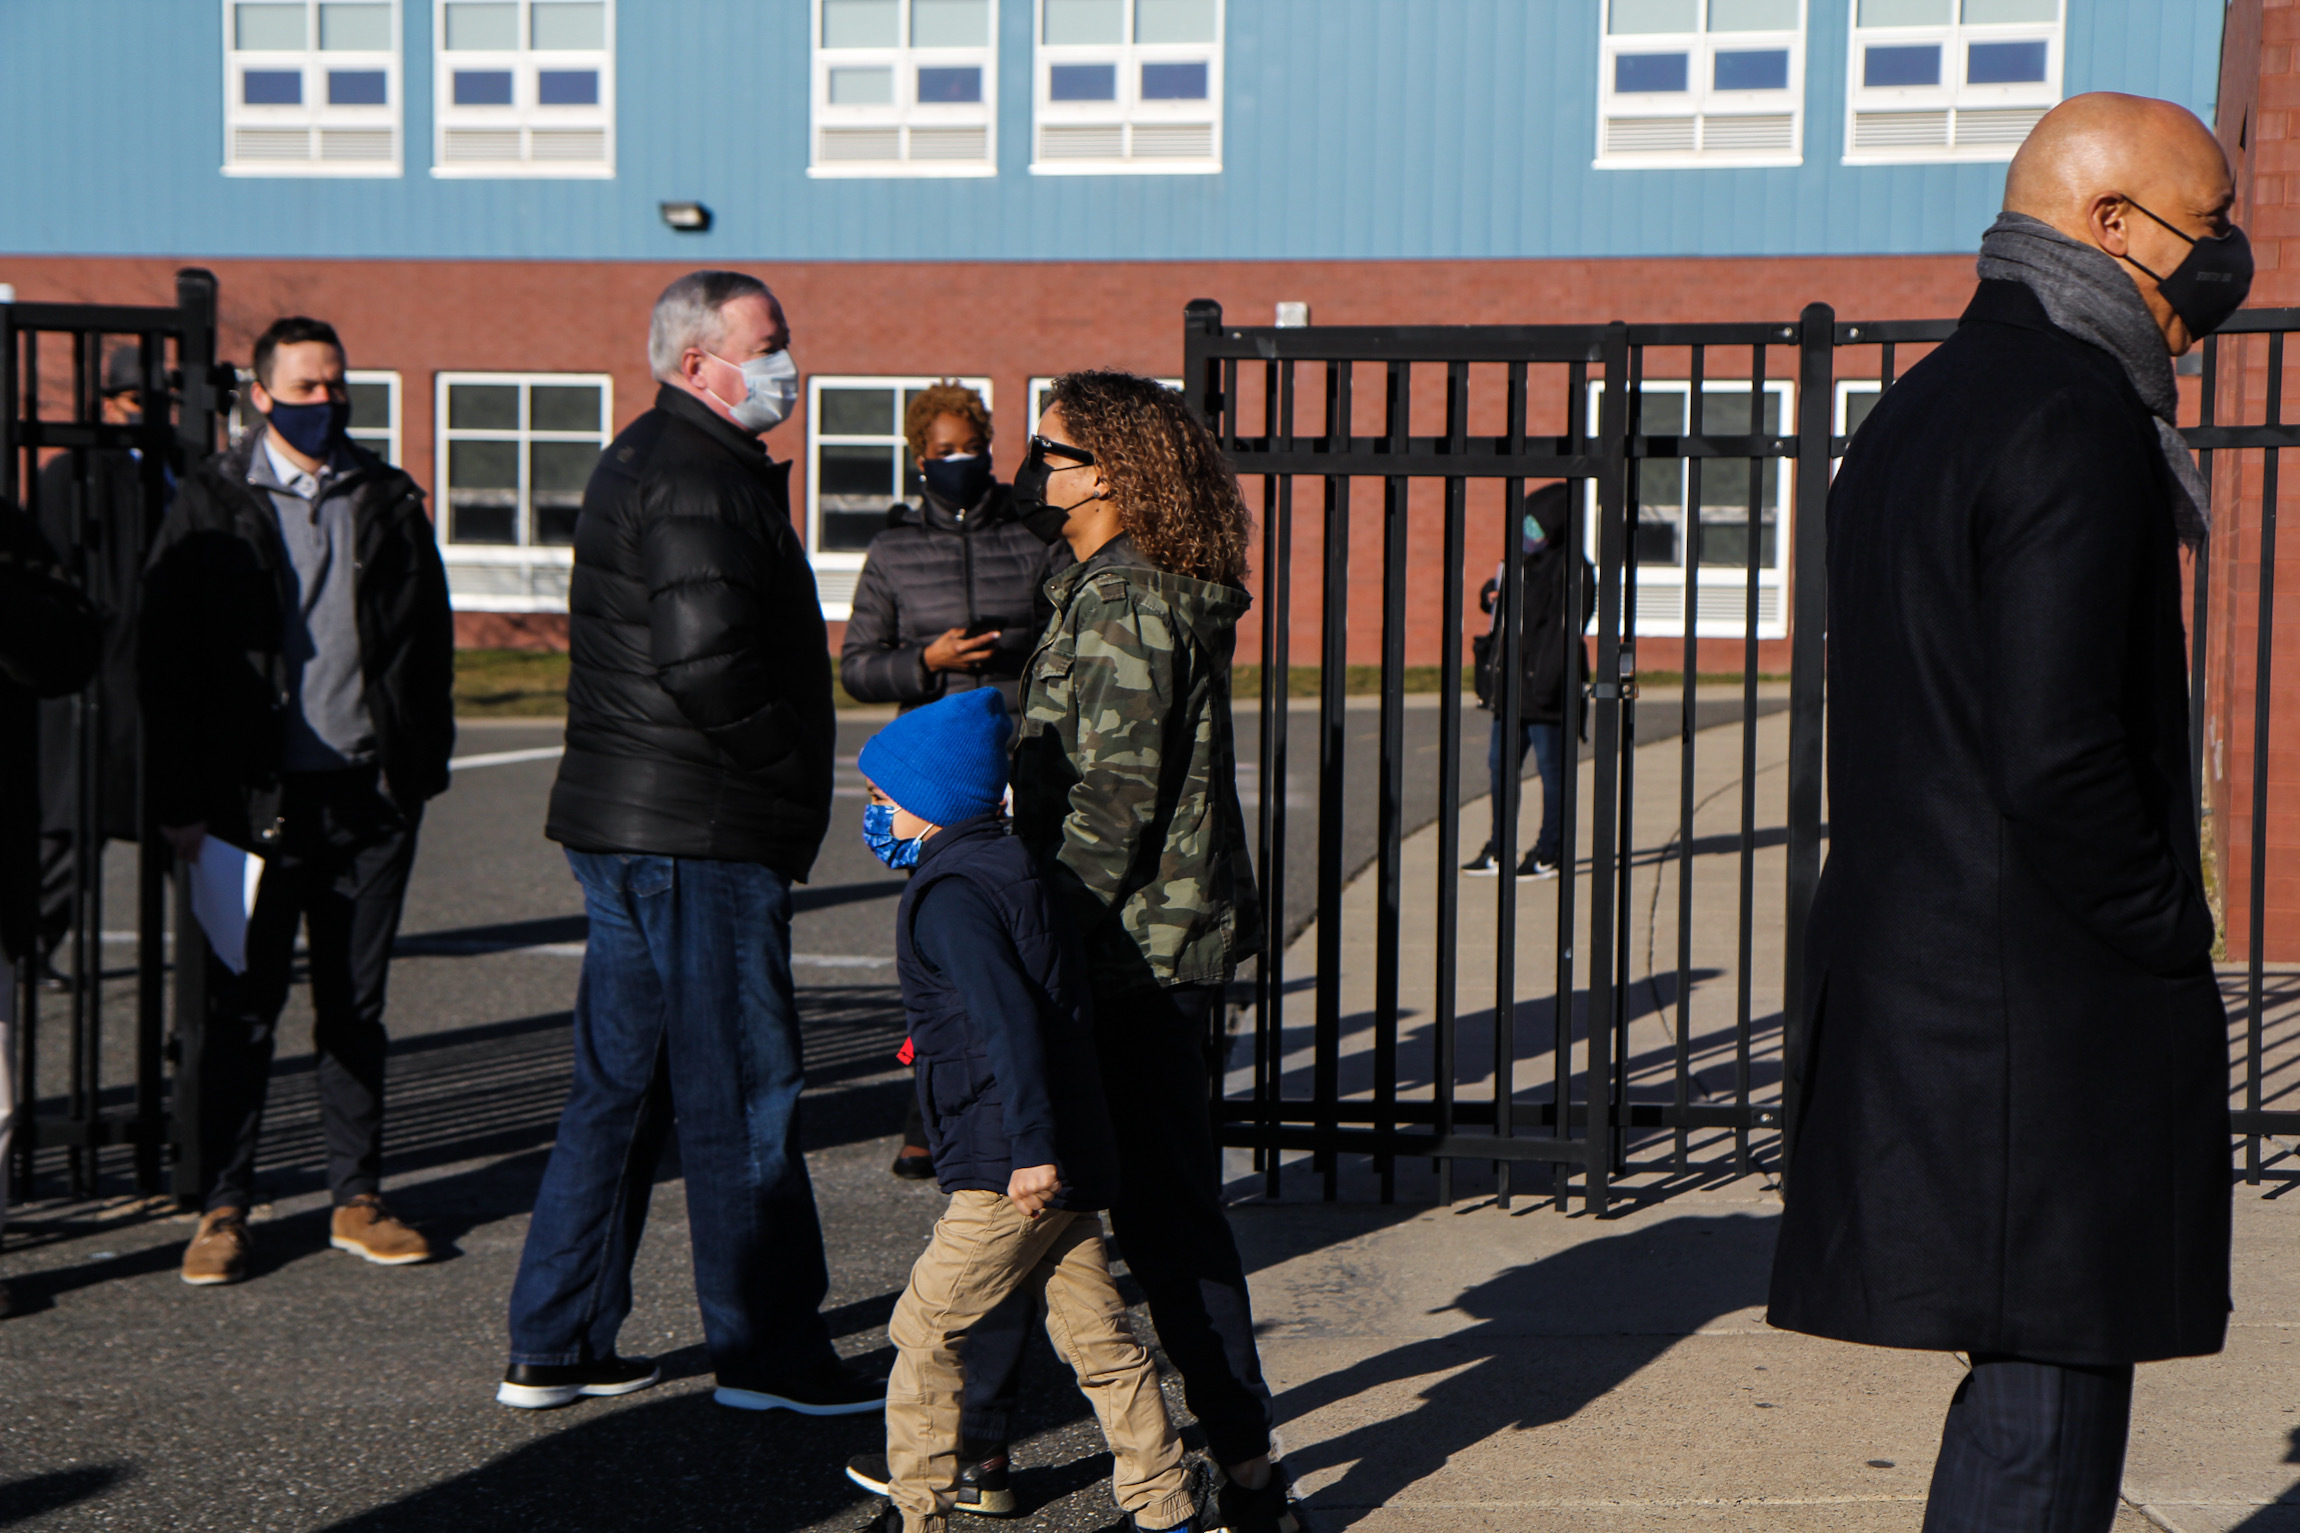 Philadelphia School District Superintendent William Hite and Mayor Jim Kenney greet returning students